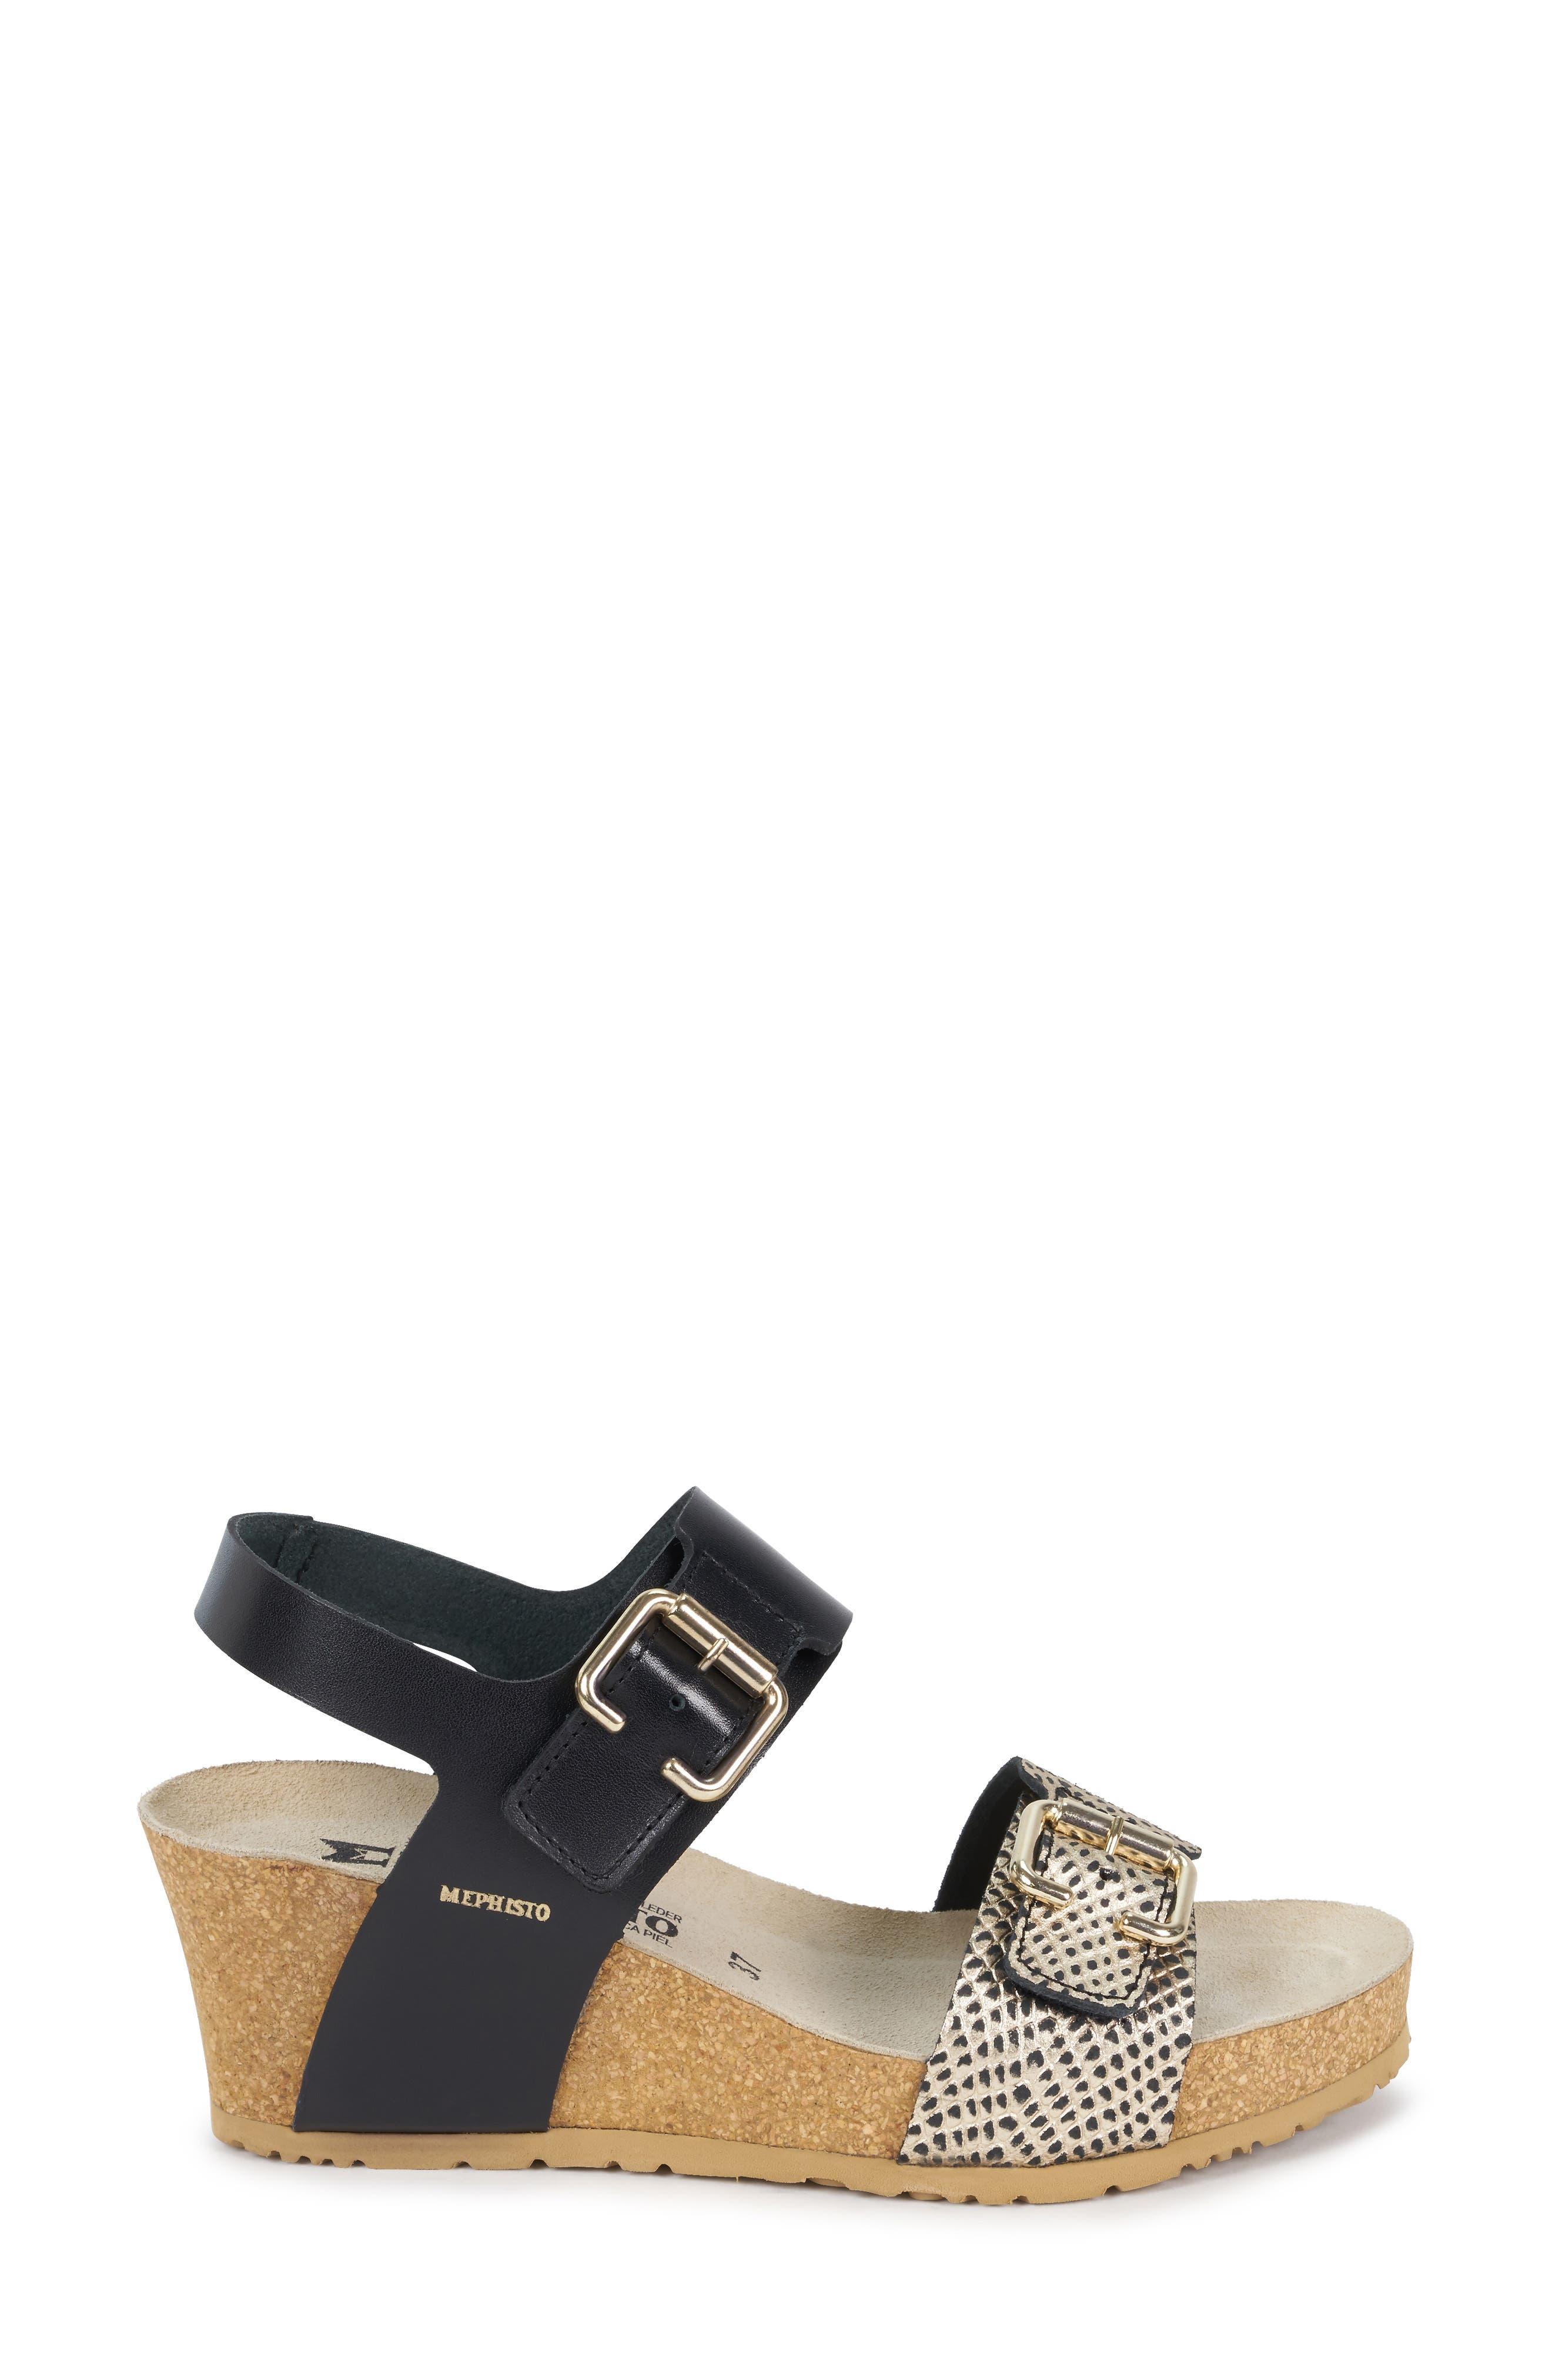 MEPHISTO, Lissandra Platform Wedge Sandal, Alternate thumbnail 3, color, BLACK/ GOLD LEATHER